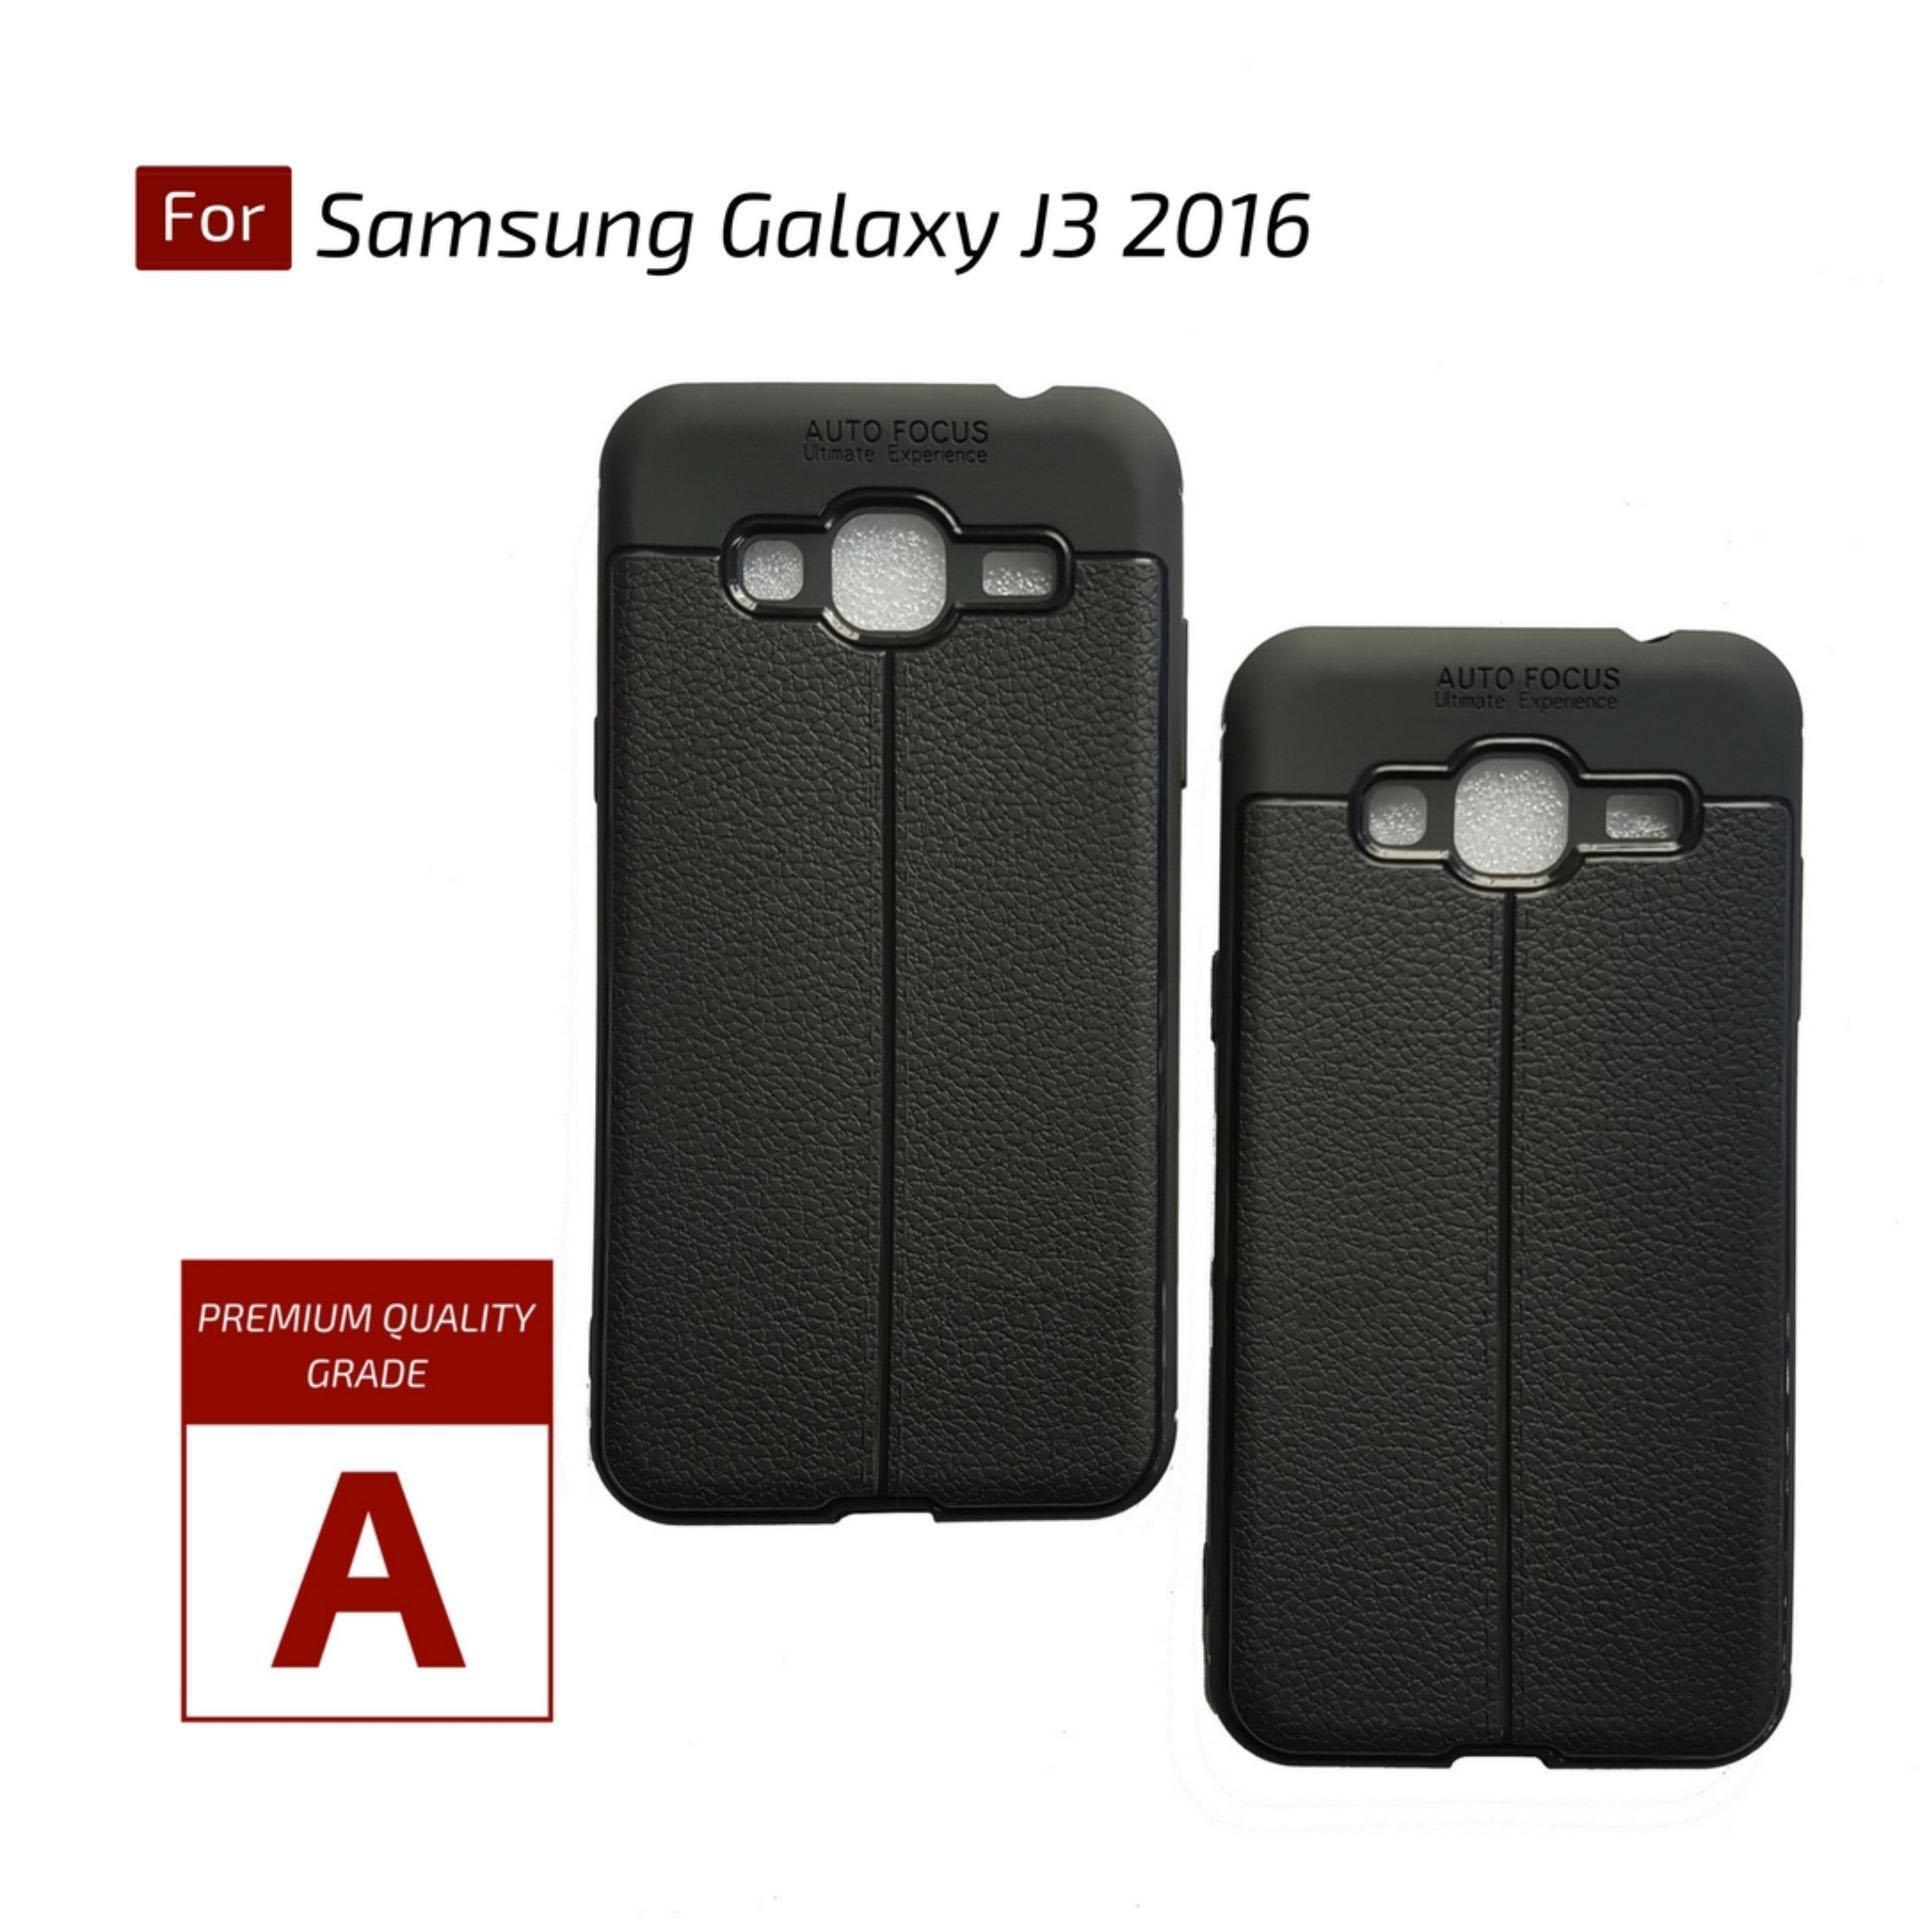 Kenzoe Premium Ultimate Shockproof Leather Case For Samsung Galaxy J3 2016 - Black